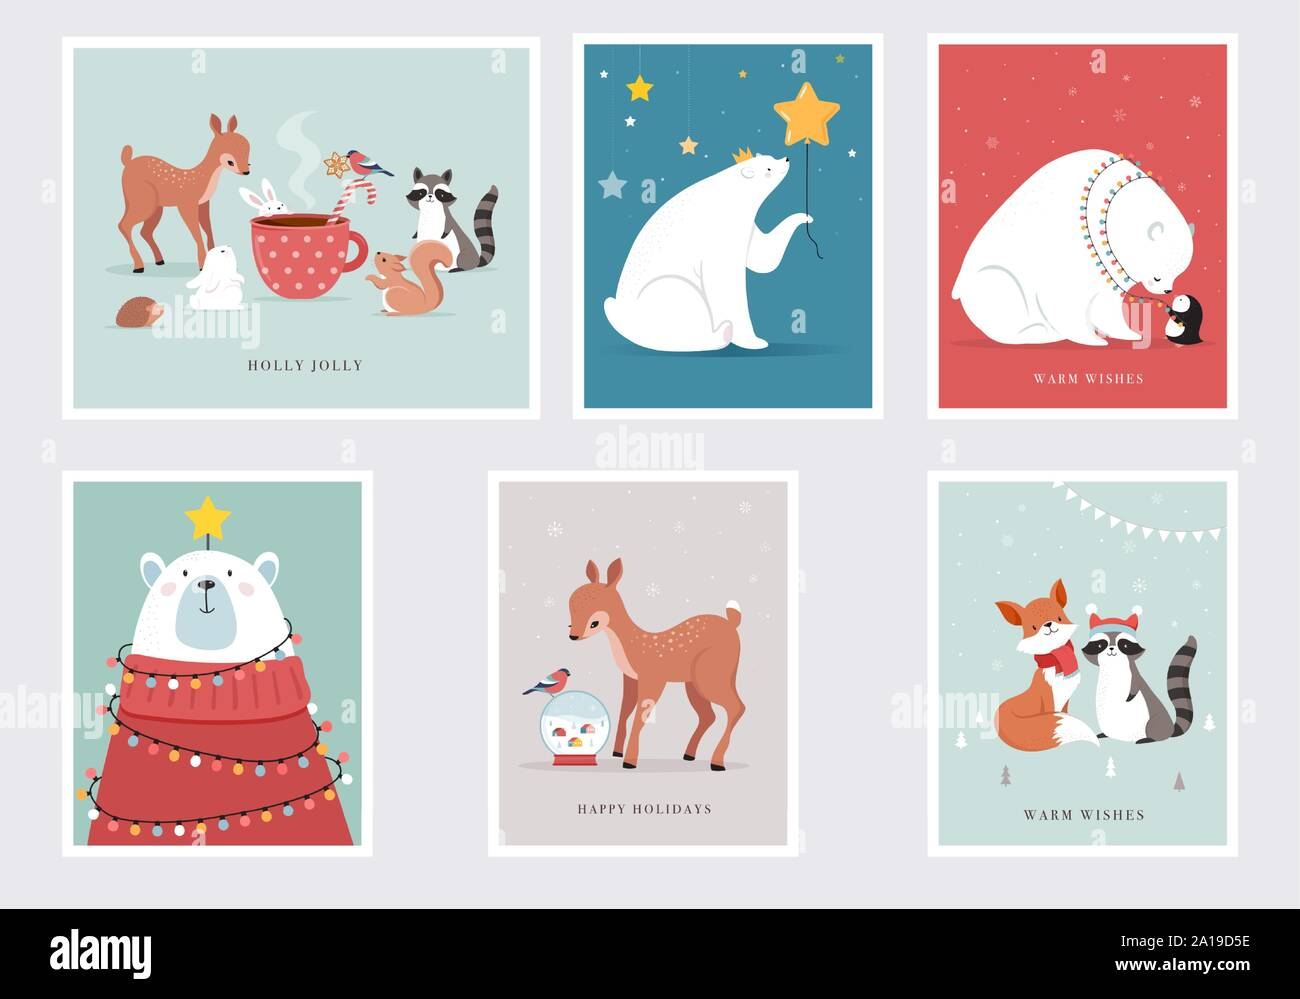 Baby Jesus Fox Rabbit Deer Raccoons Squirrel Religious Christmas Greeting Card